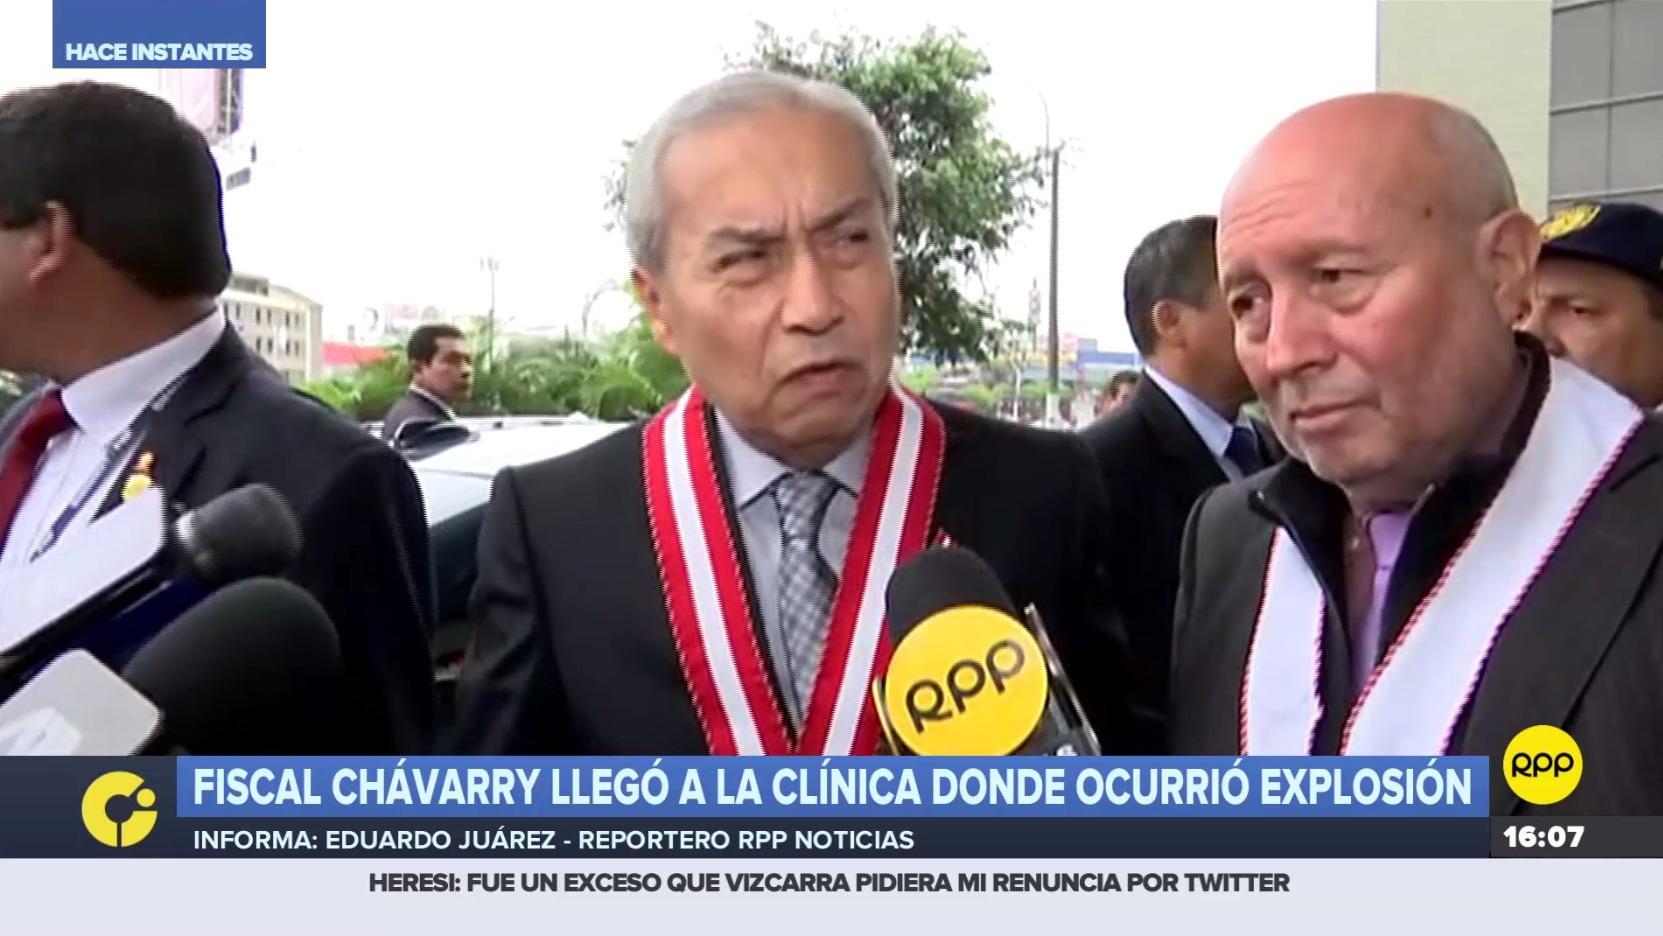 Fiscal Pedro Chavarry llegó a la clínica en San Isidro donde ocurrió explosión.